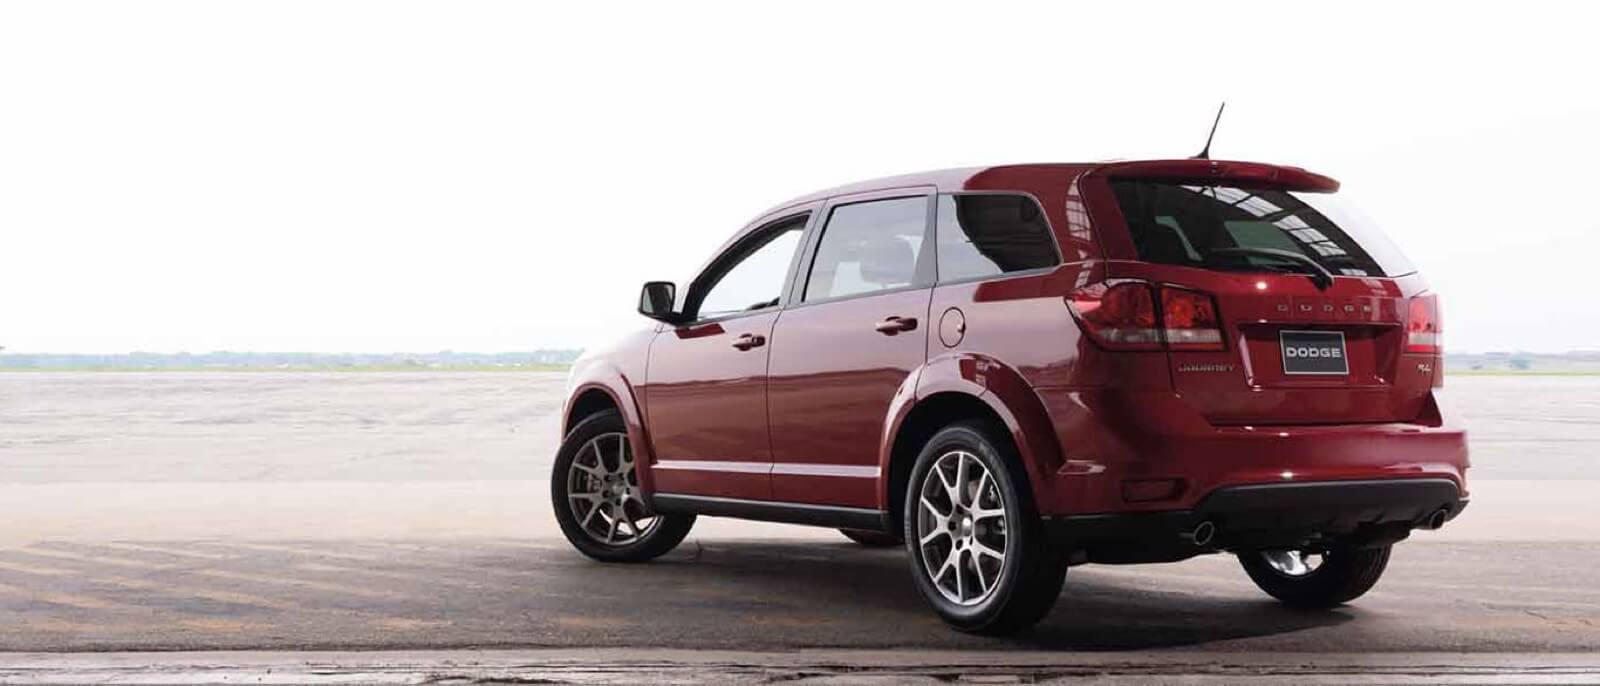 2016-Dodge-Journey rear